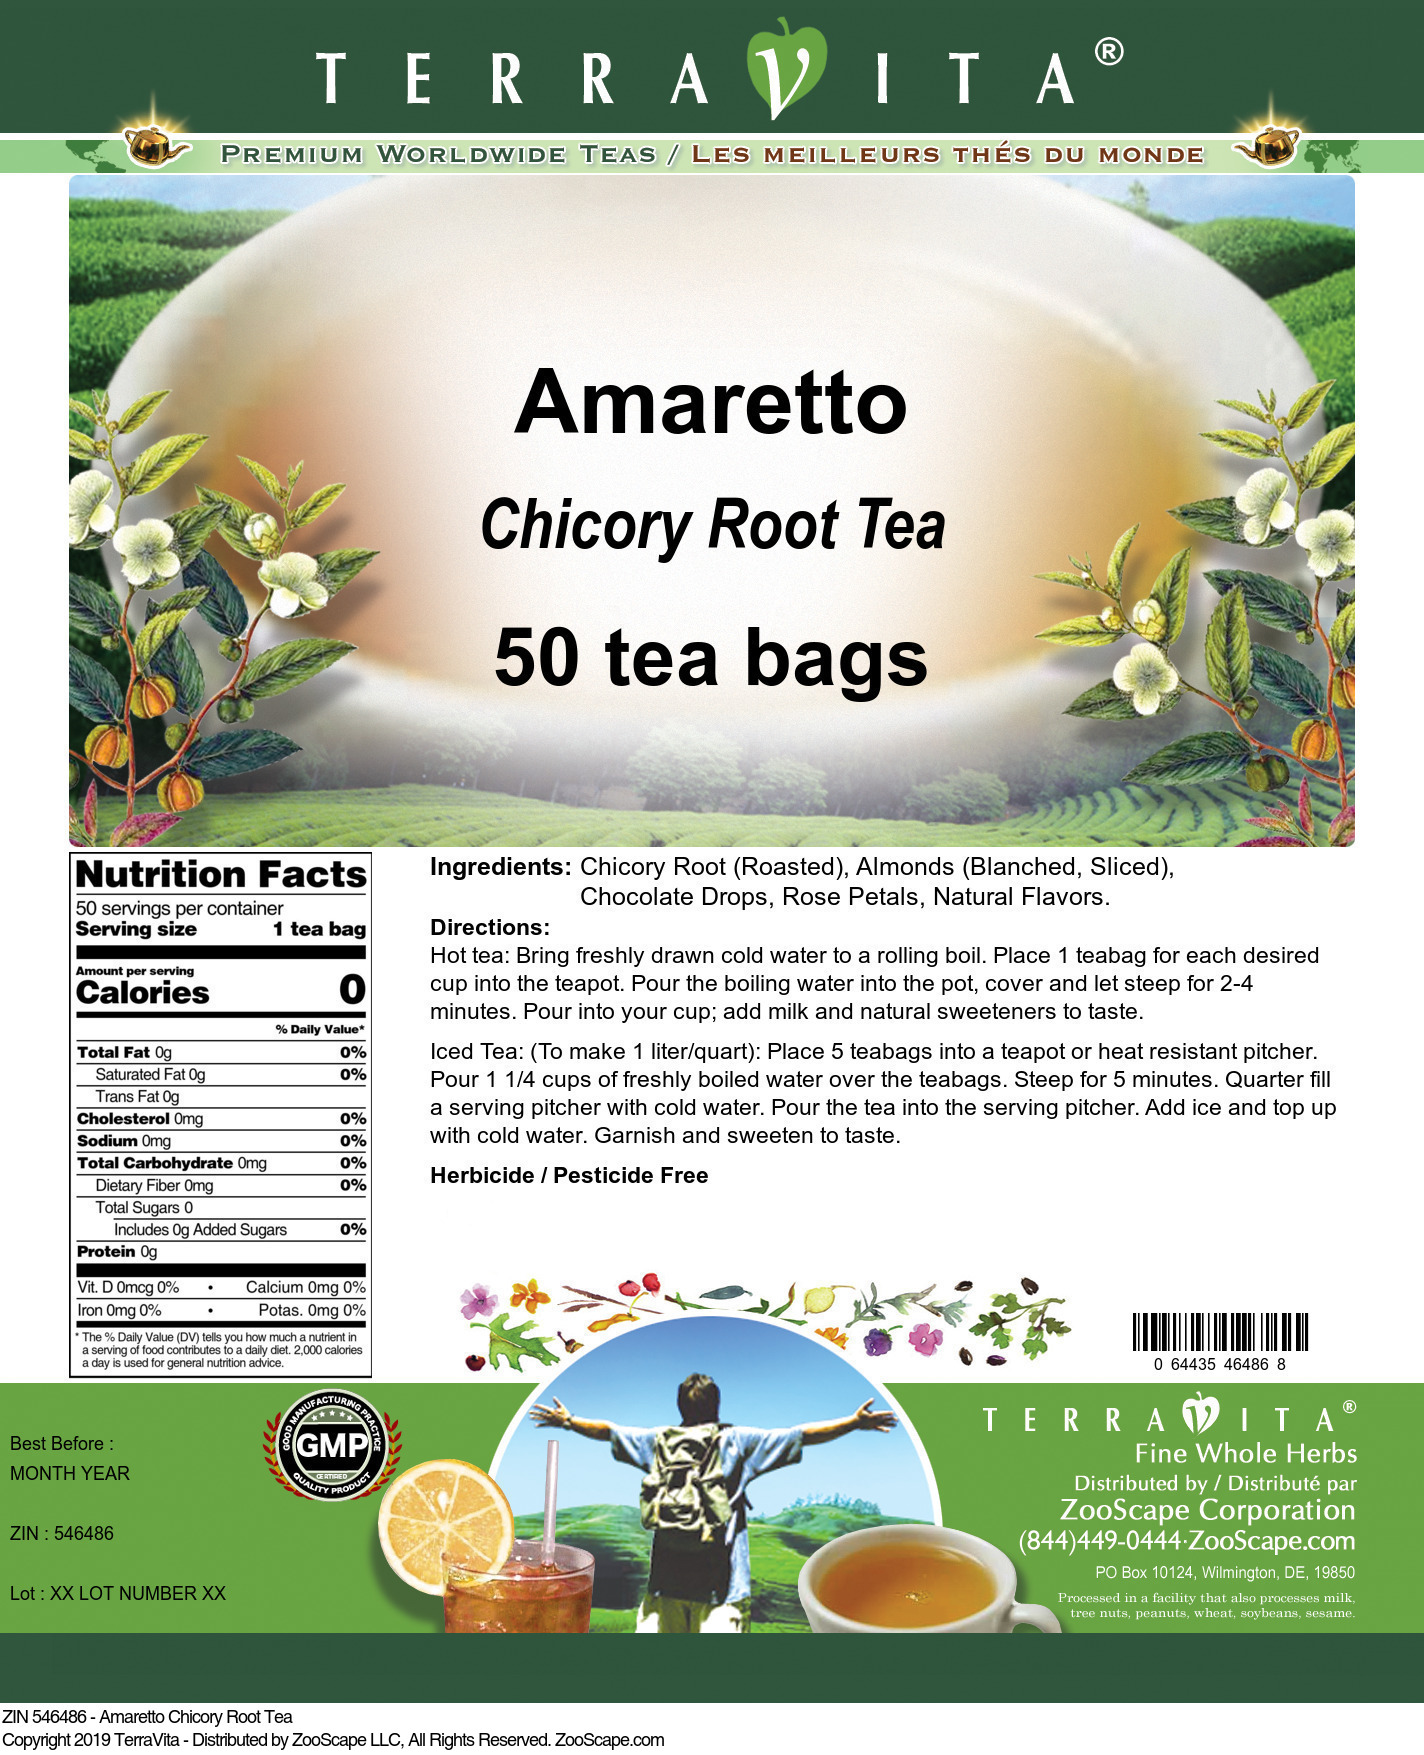 Amaretto Chicory Root Tea